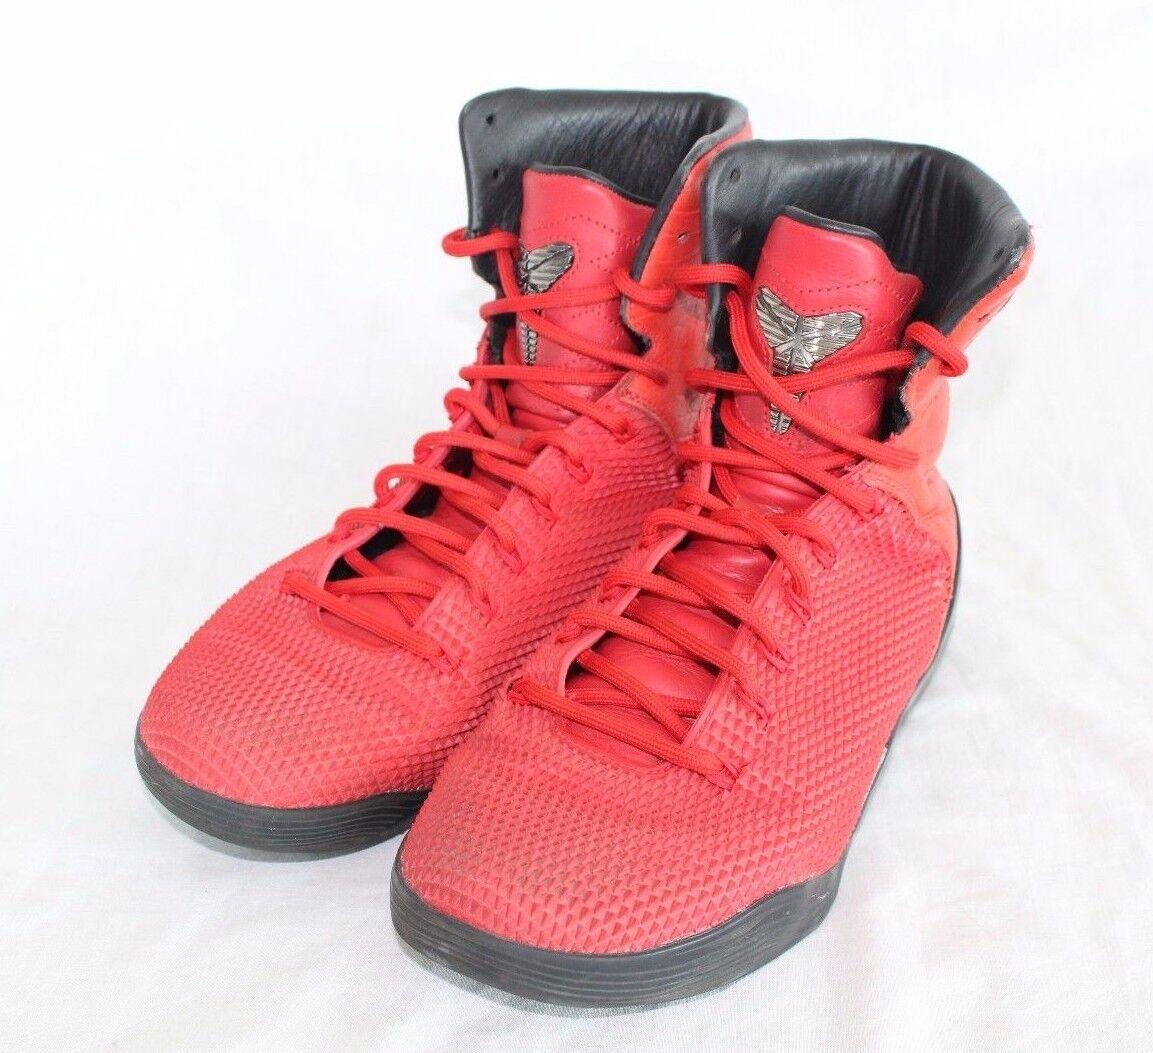 finest selection 7bd9d 2f58a Nike Kobe IX High High High KRM EXT QS Challenge Red 716993-600 SZ 8 004f35